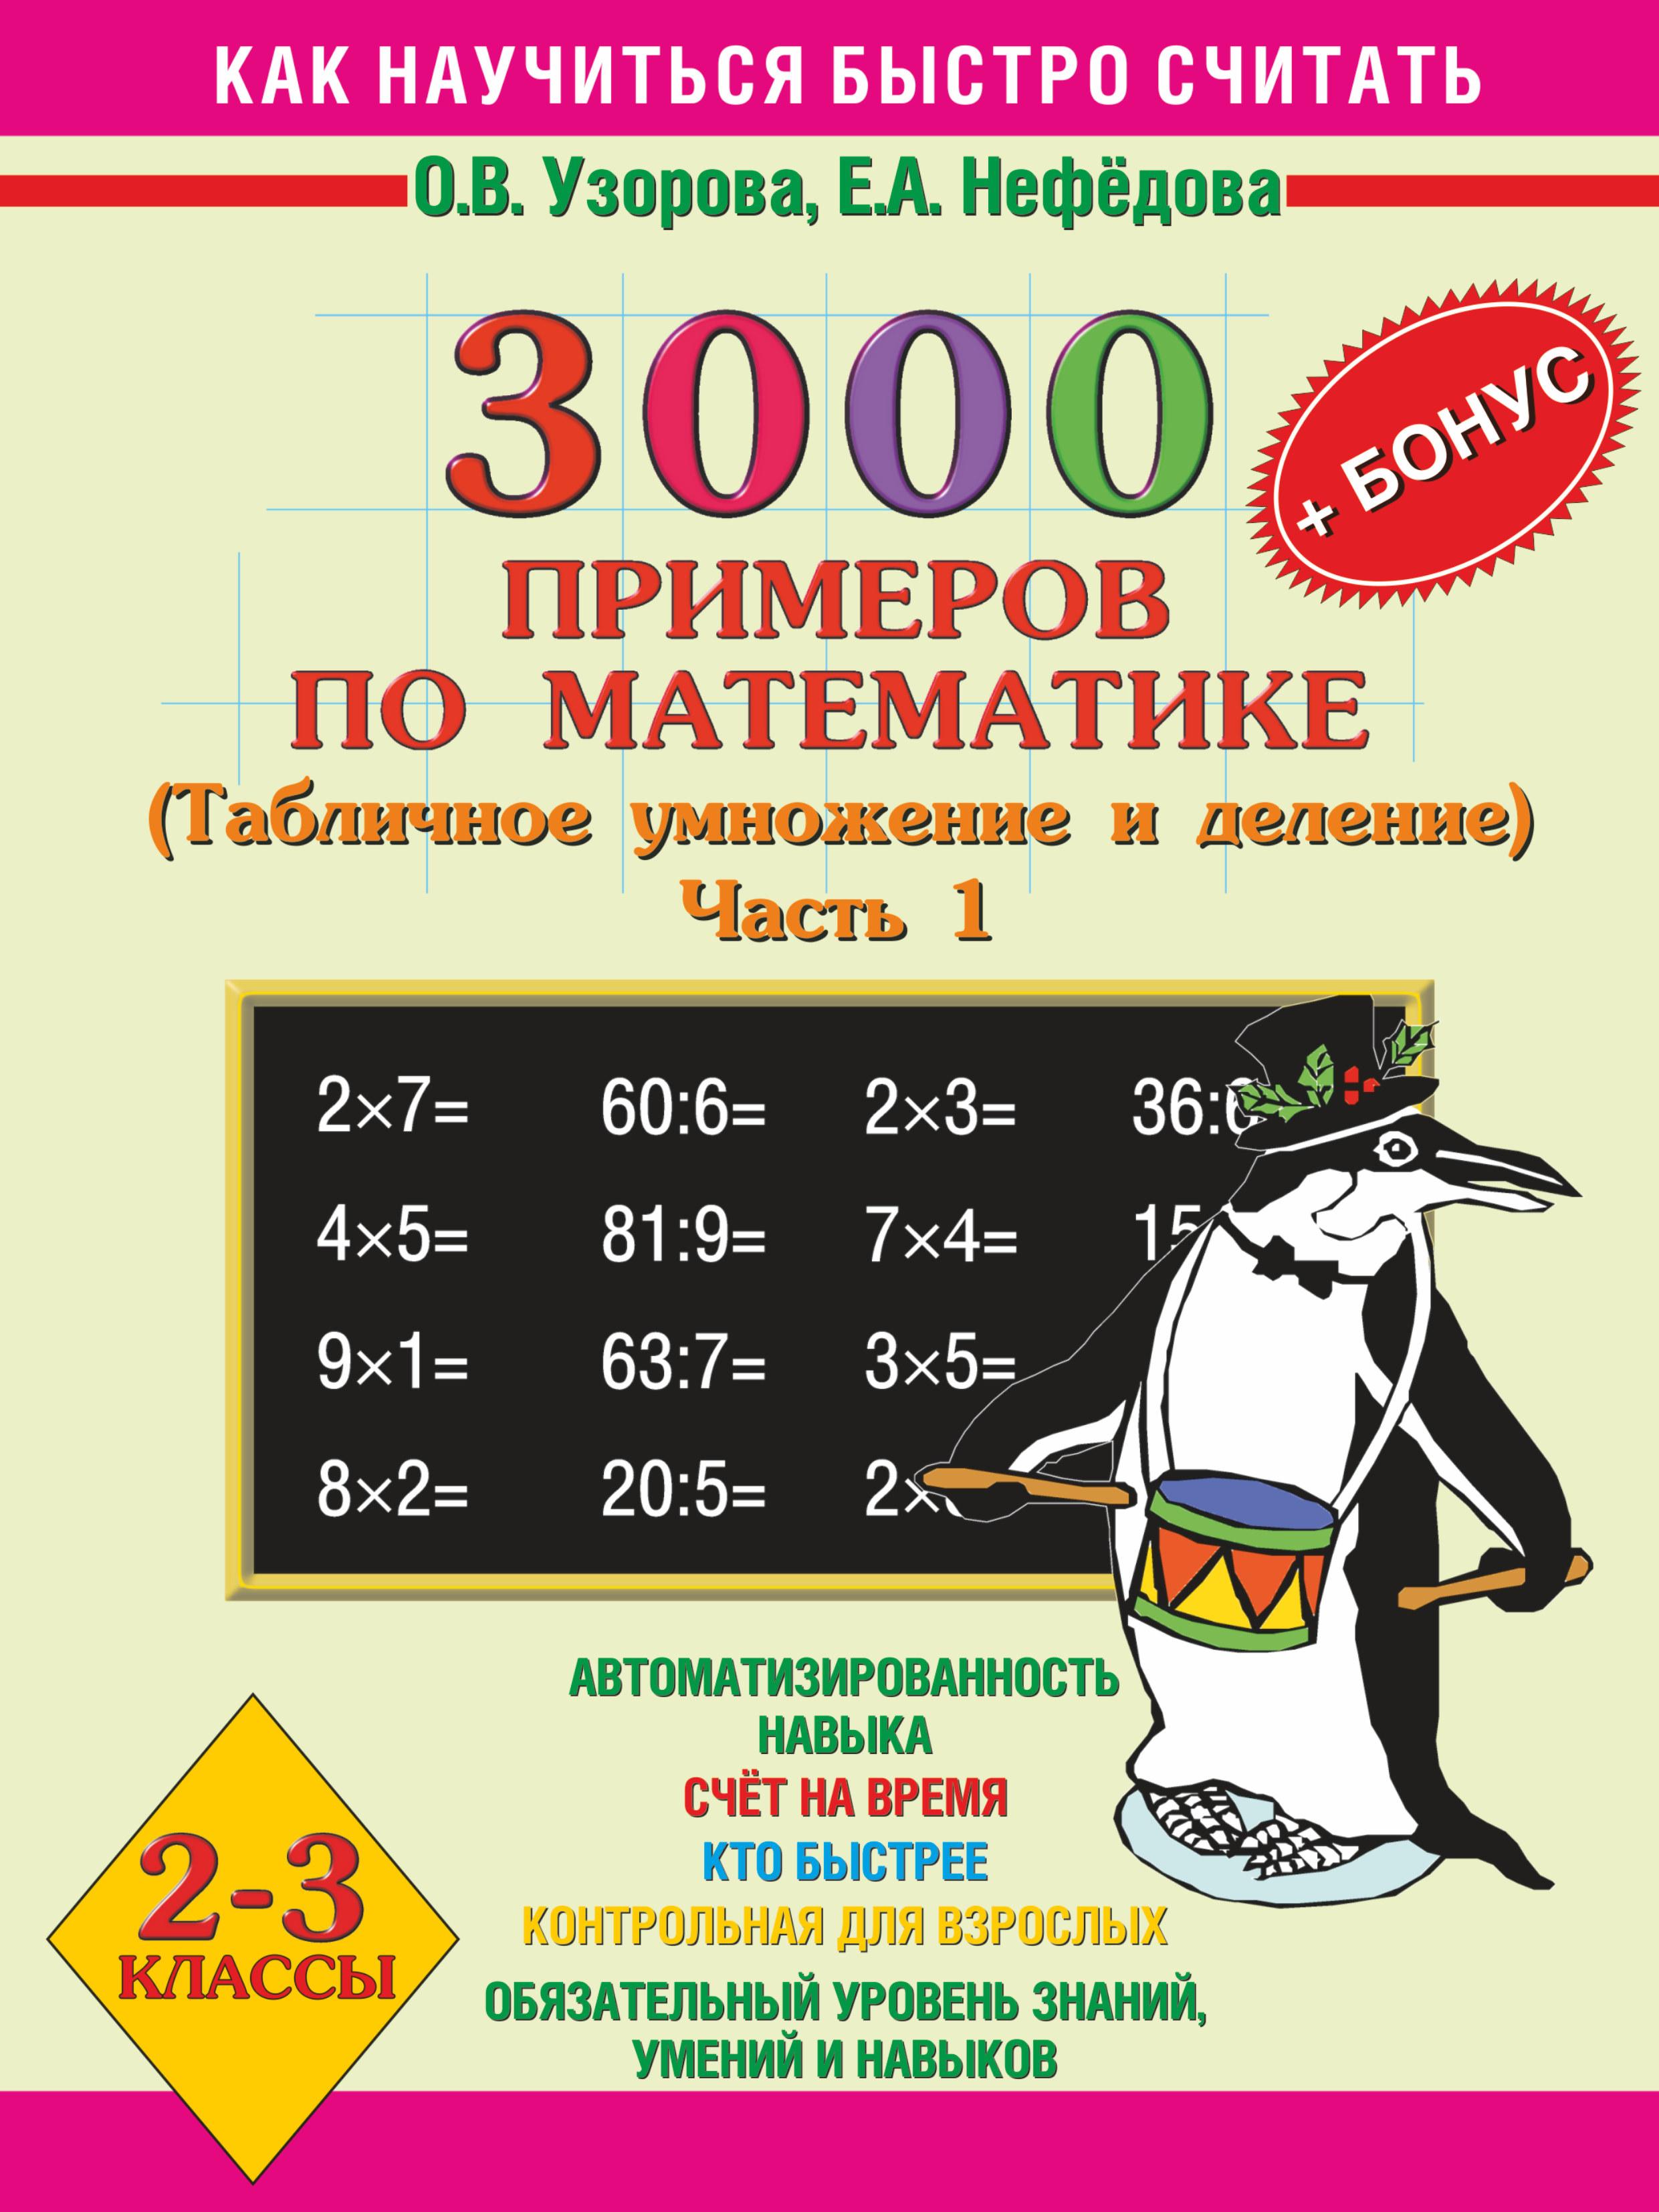 Гдз по математике 5 класс виленкина жохов чесноков шварцбурд москва